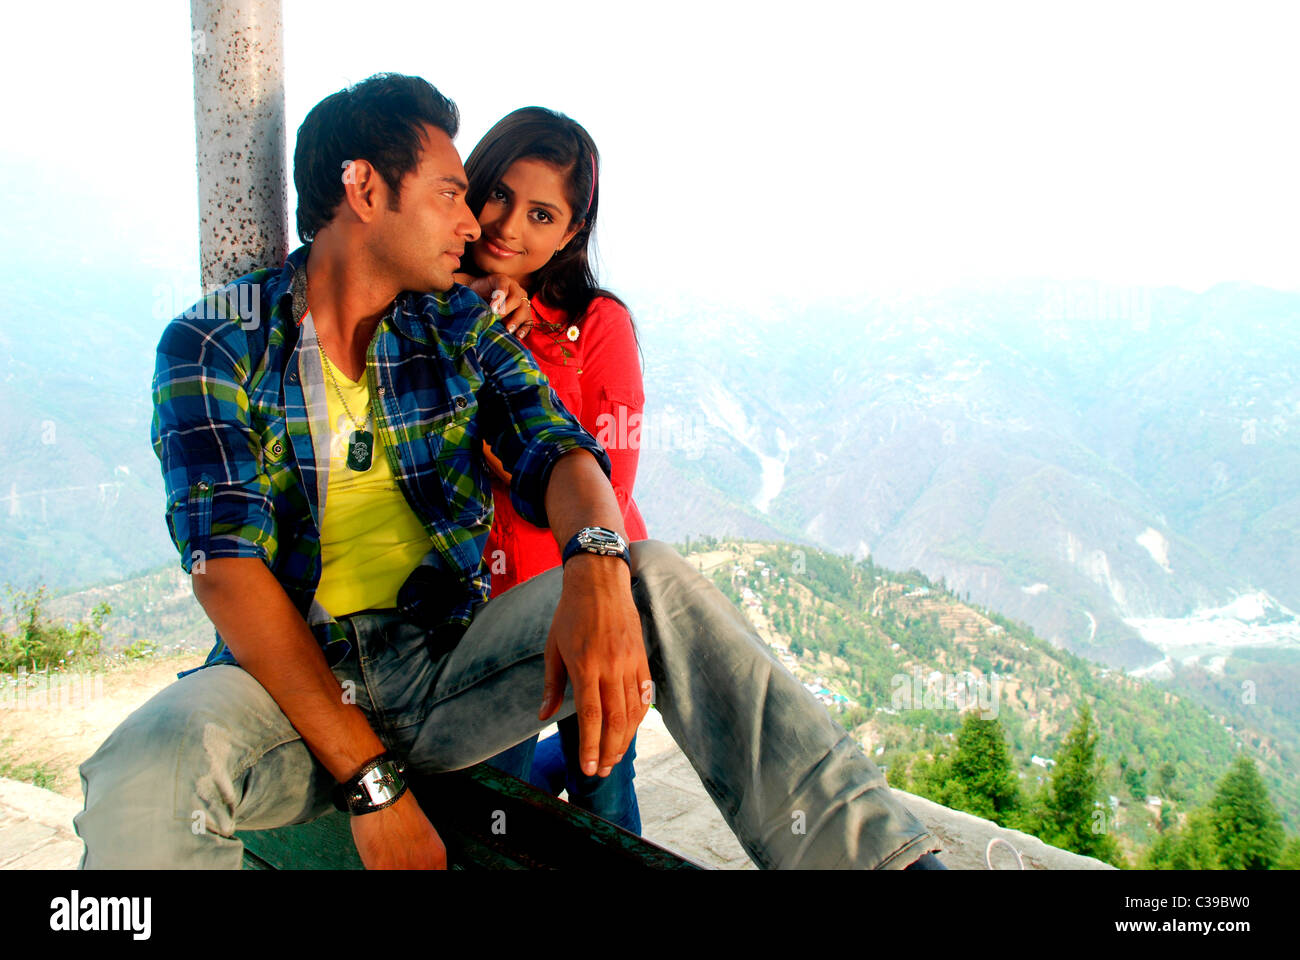 Love Pose Indian Boy Girl Stock Photos Love Pose Indian Boy Girl